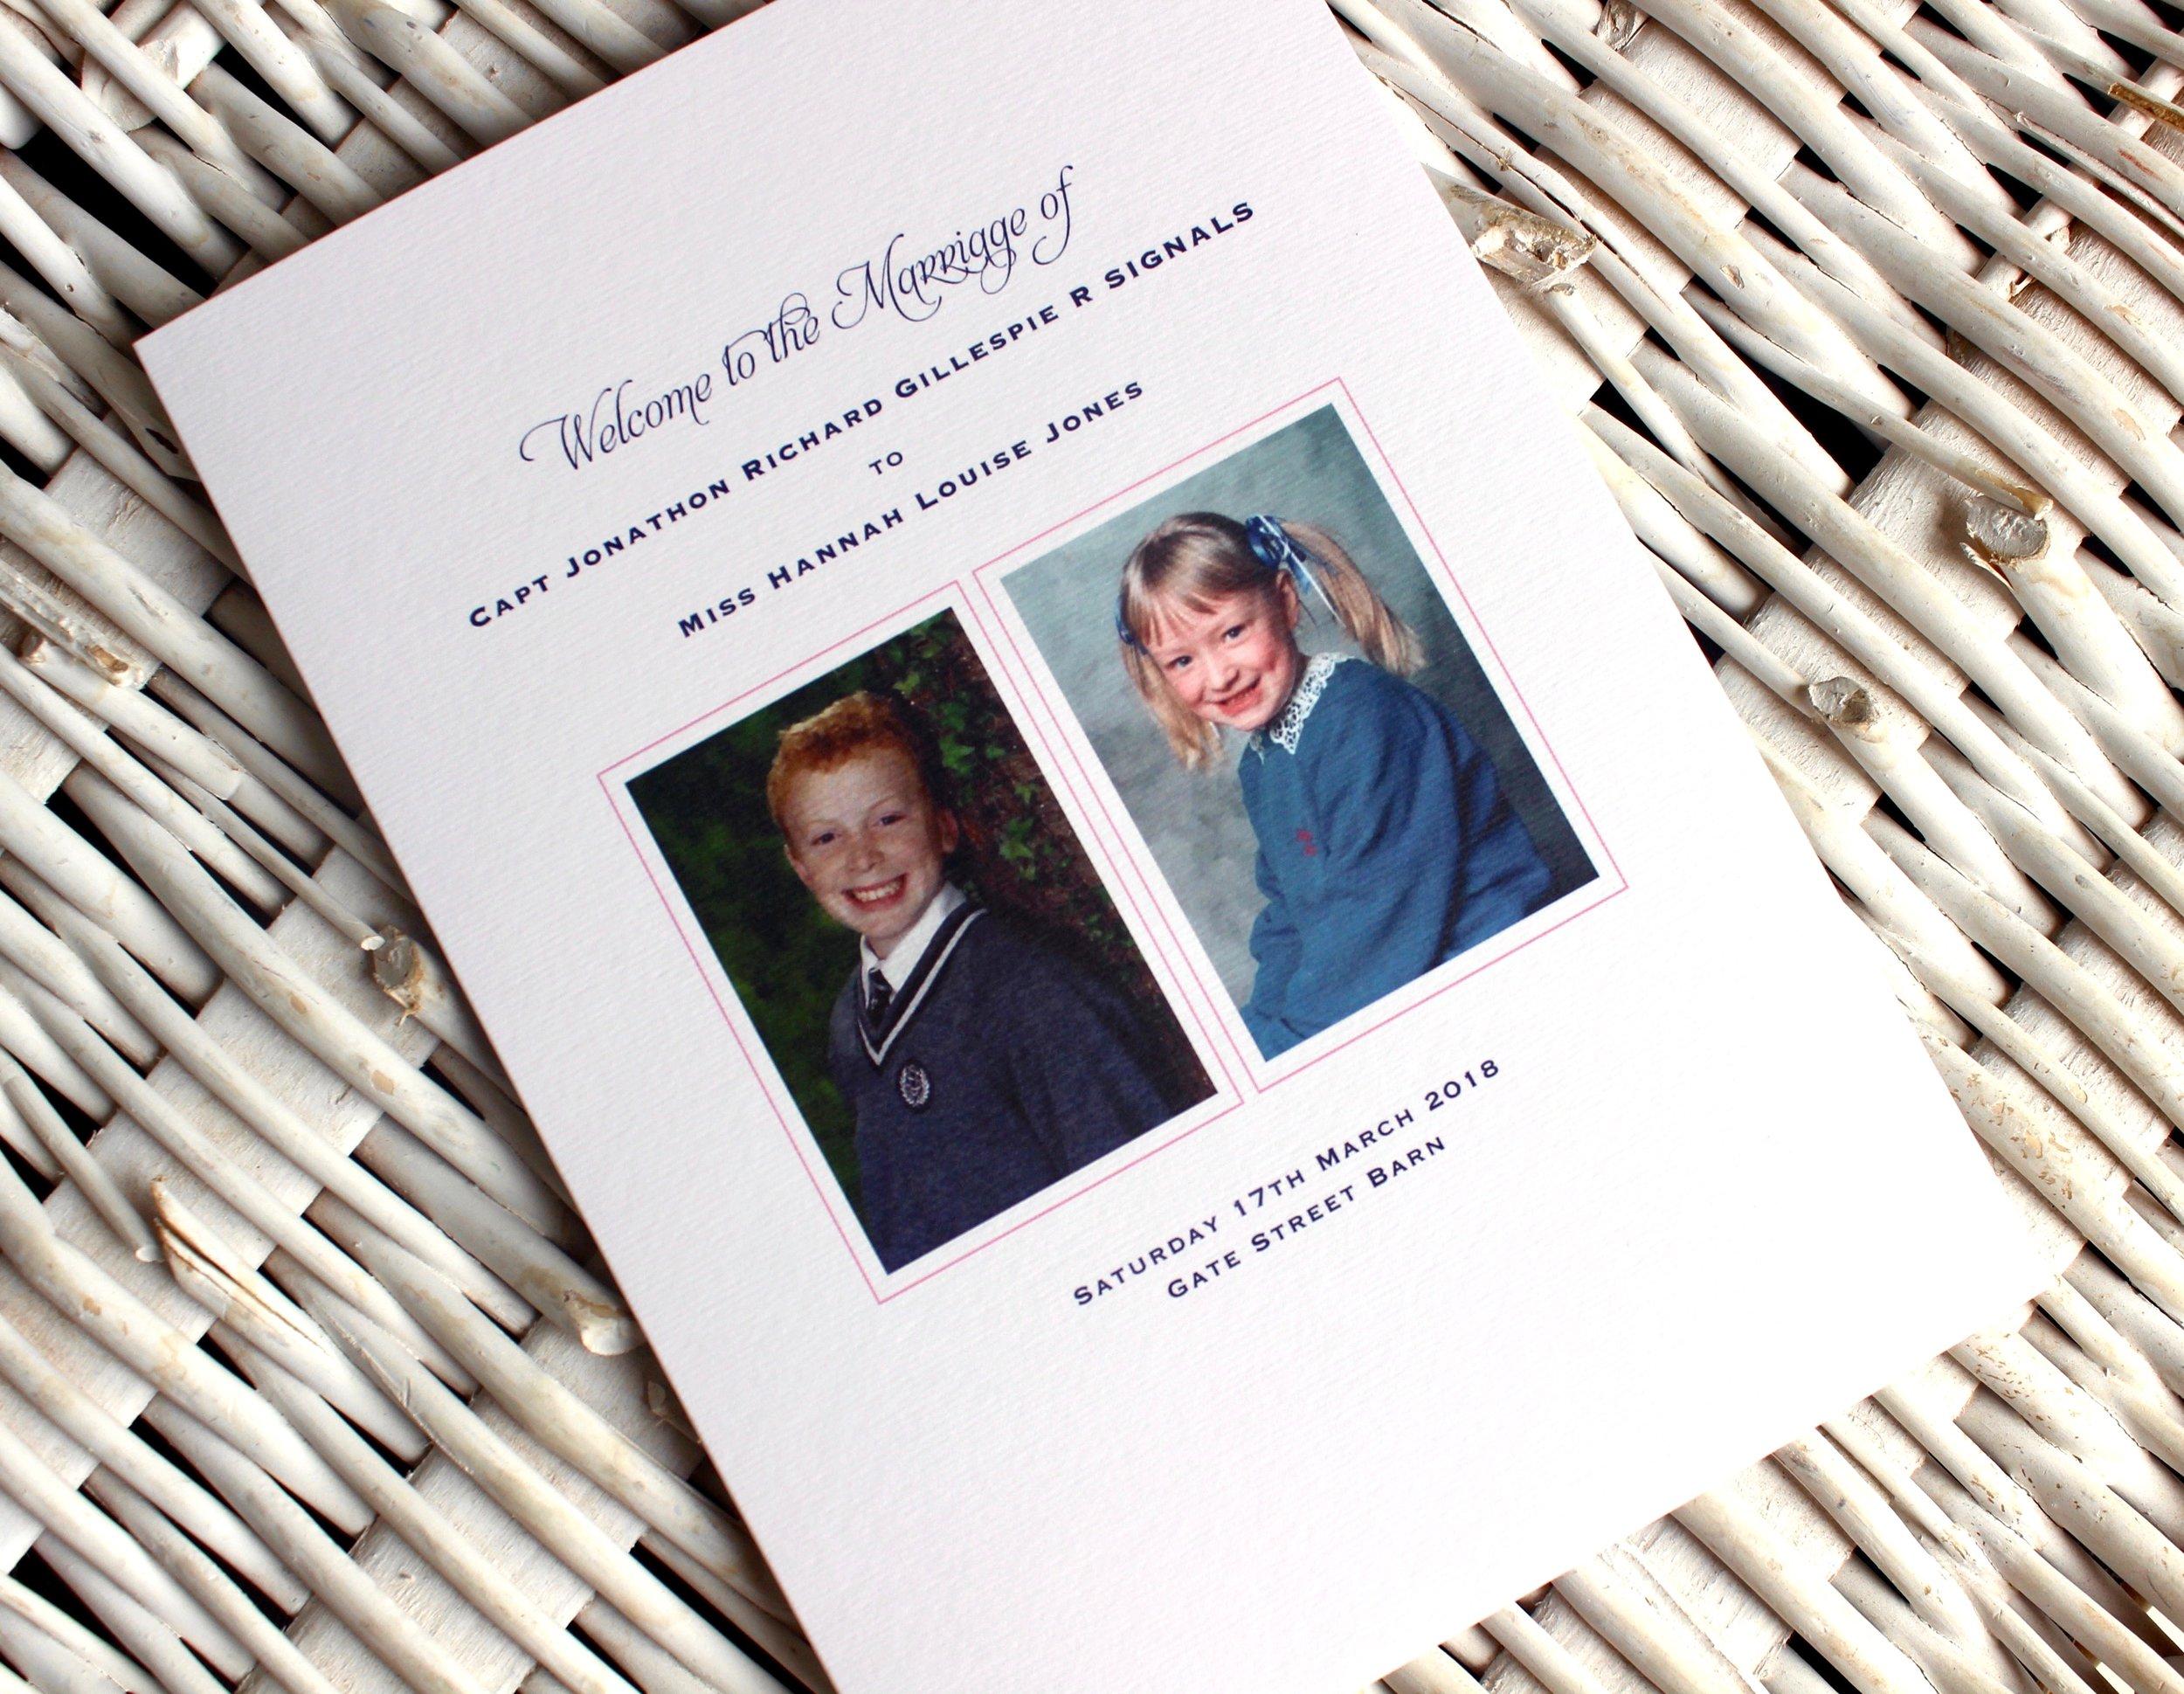 Decorative Order of Service Booklet